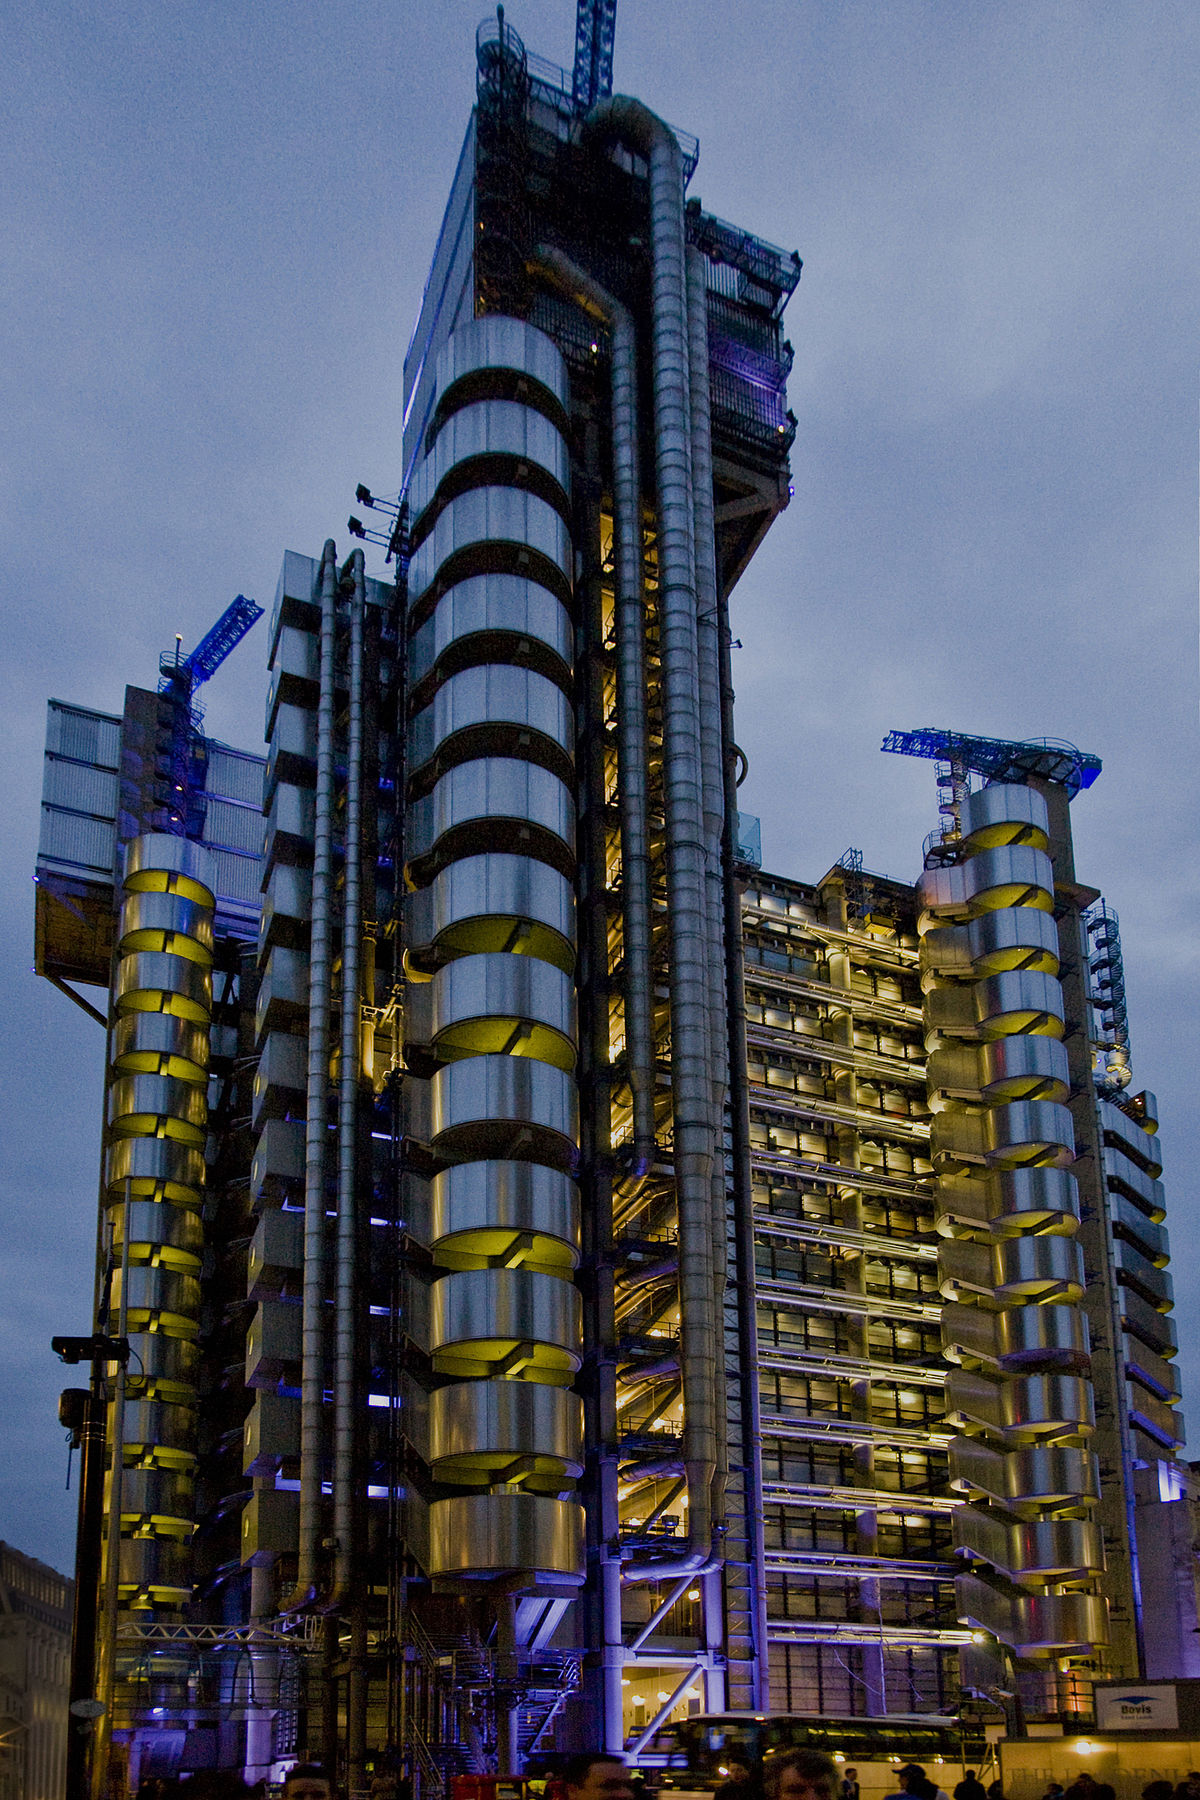 lloyd london insurance wikipedia exterior night